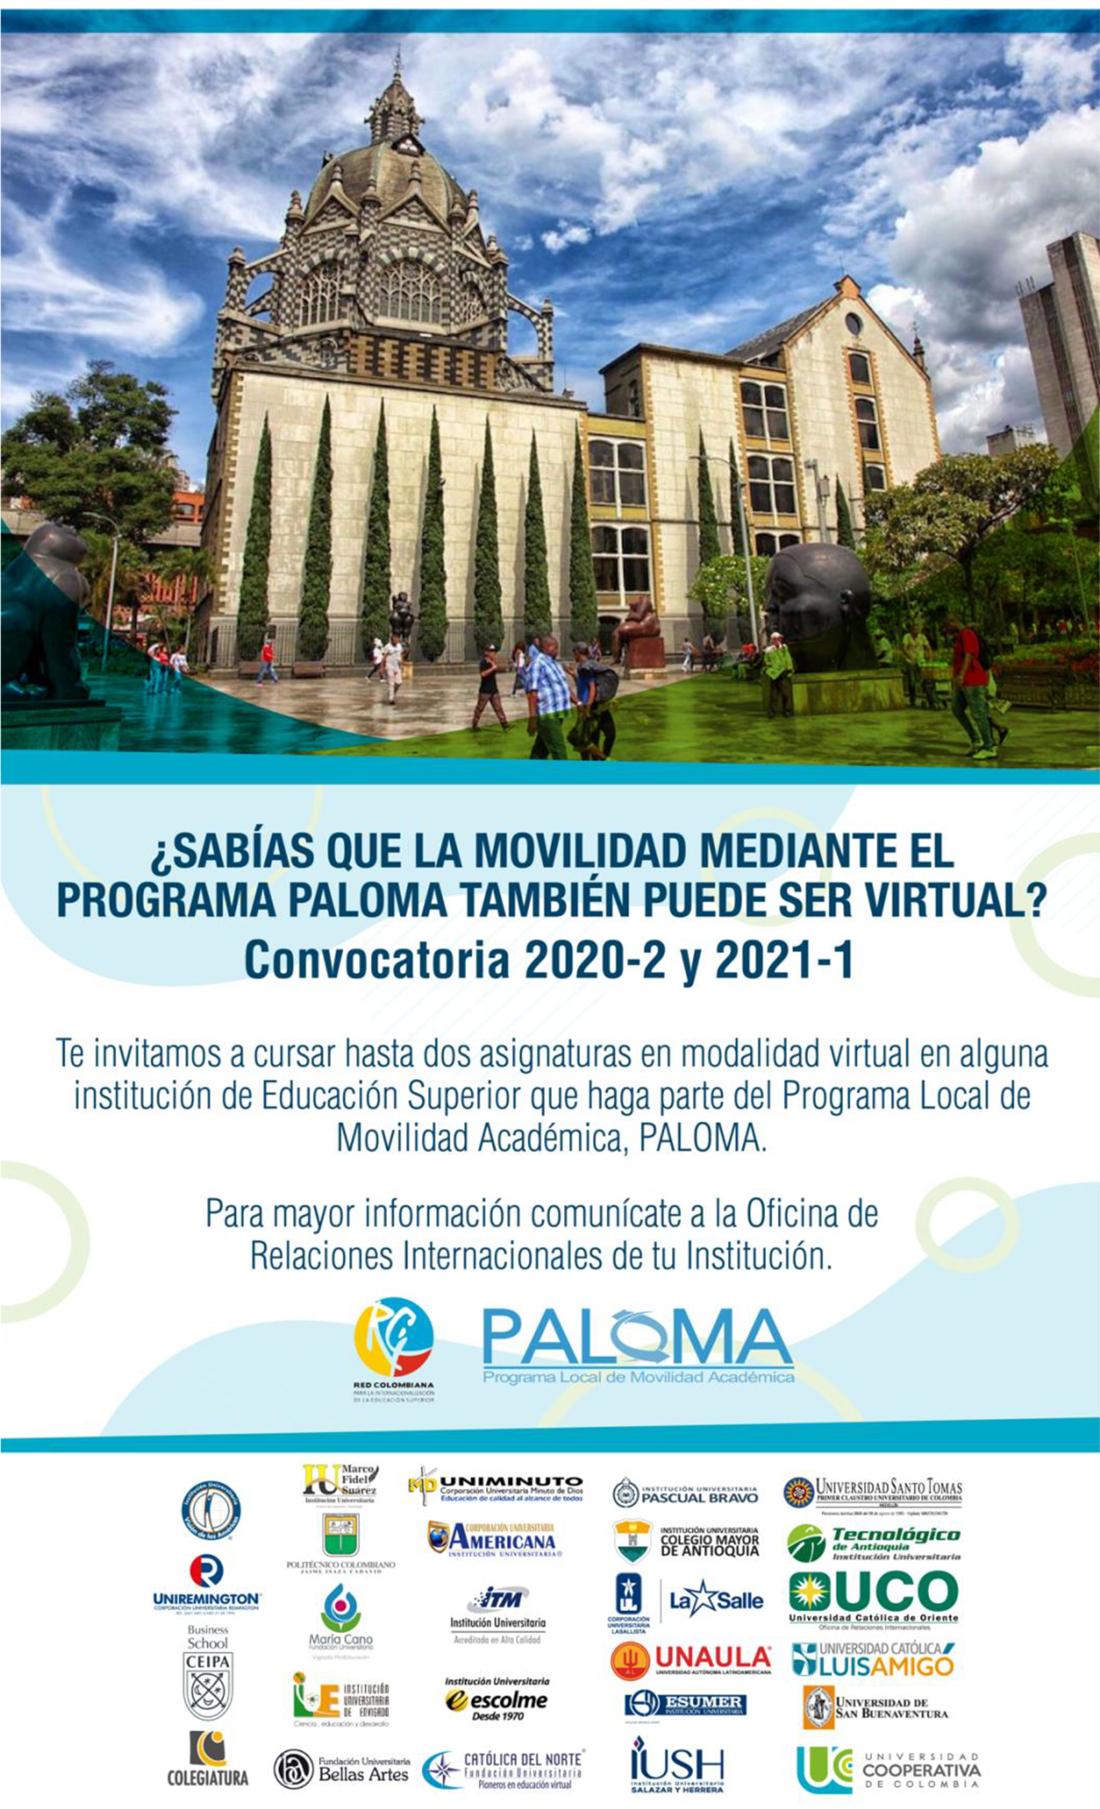 Convocatoria PALOMA virtual 2020-2